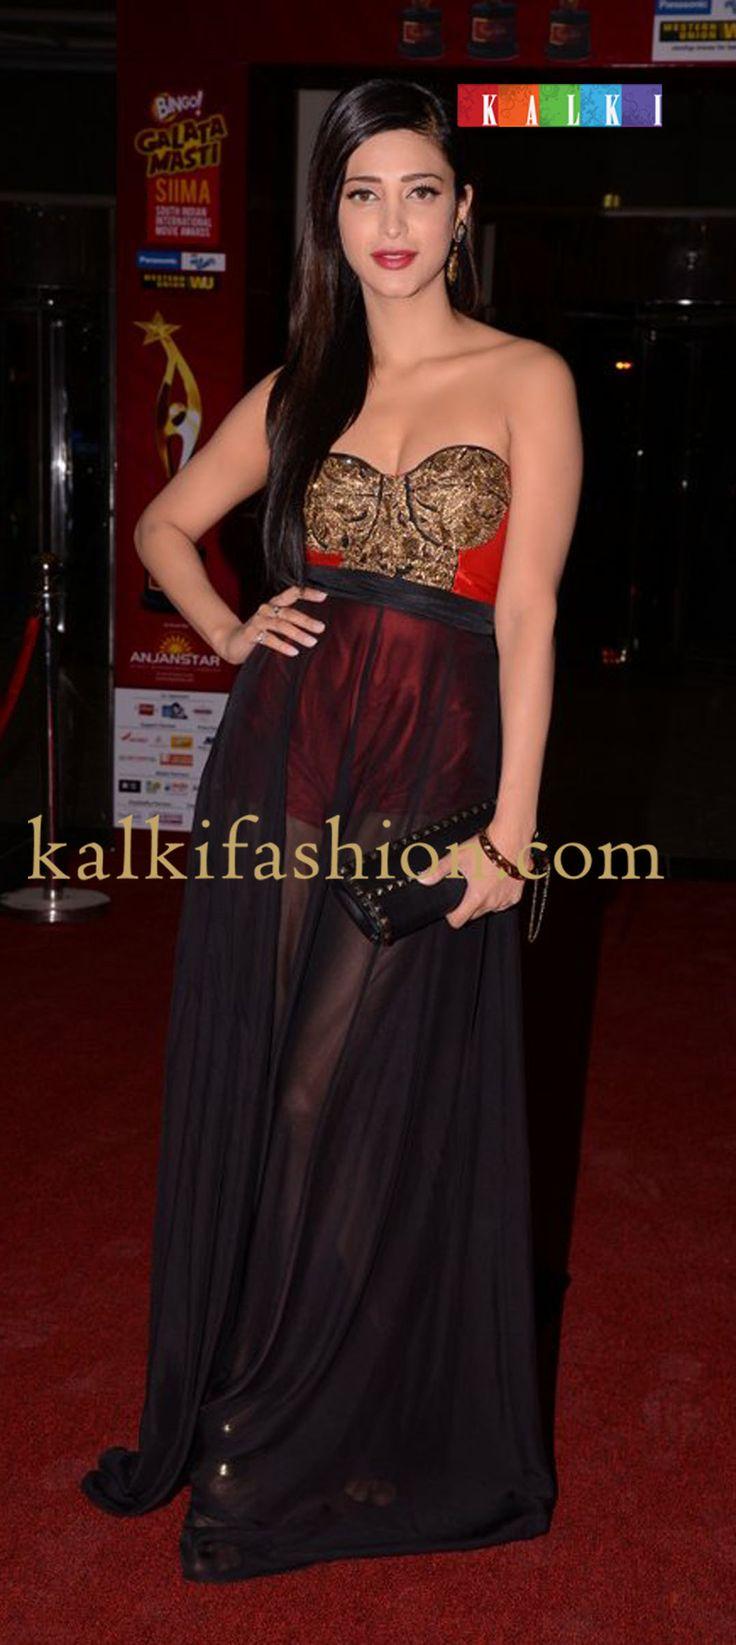 http://www.kalkifashion.com/         Shruti Hassan in Rajat Tangri black sheer gown attending the red carpet of SIIMA